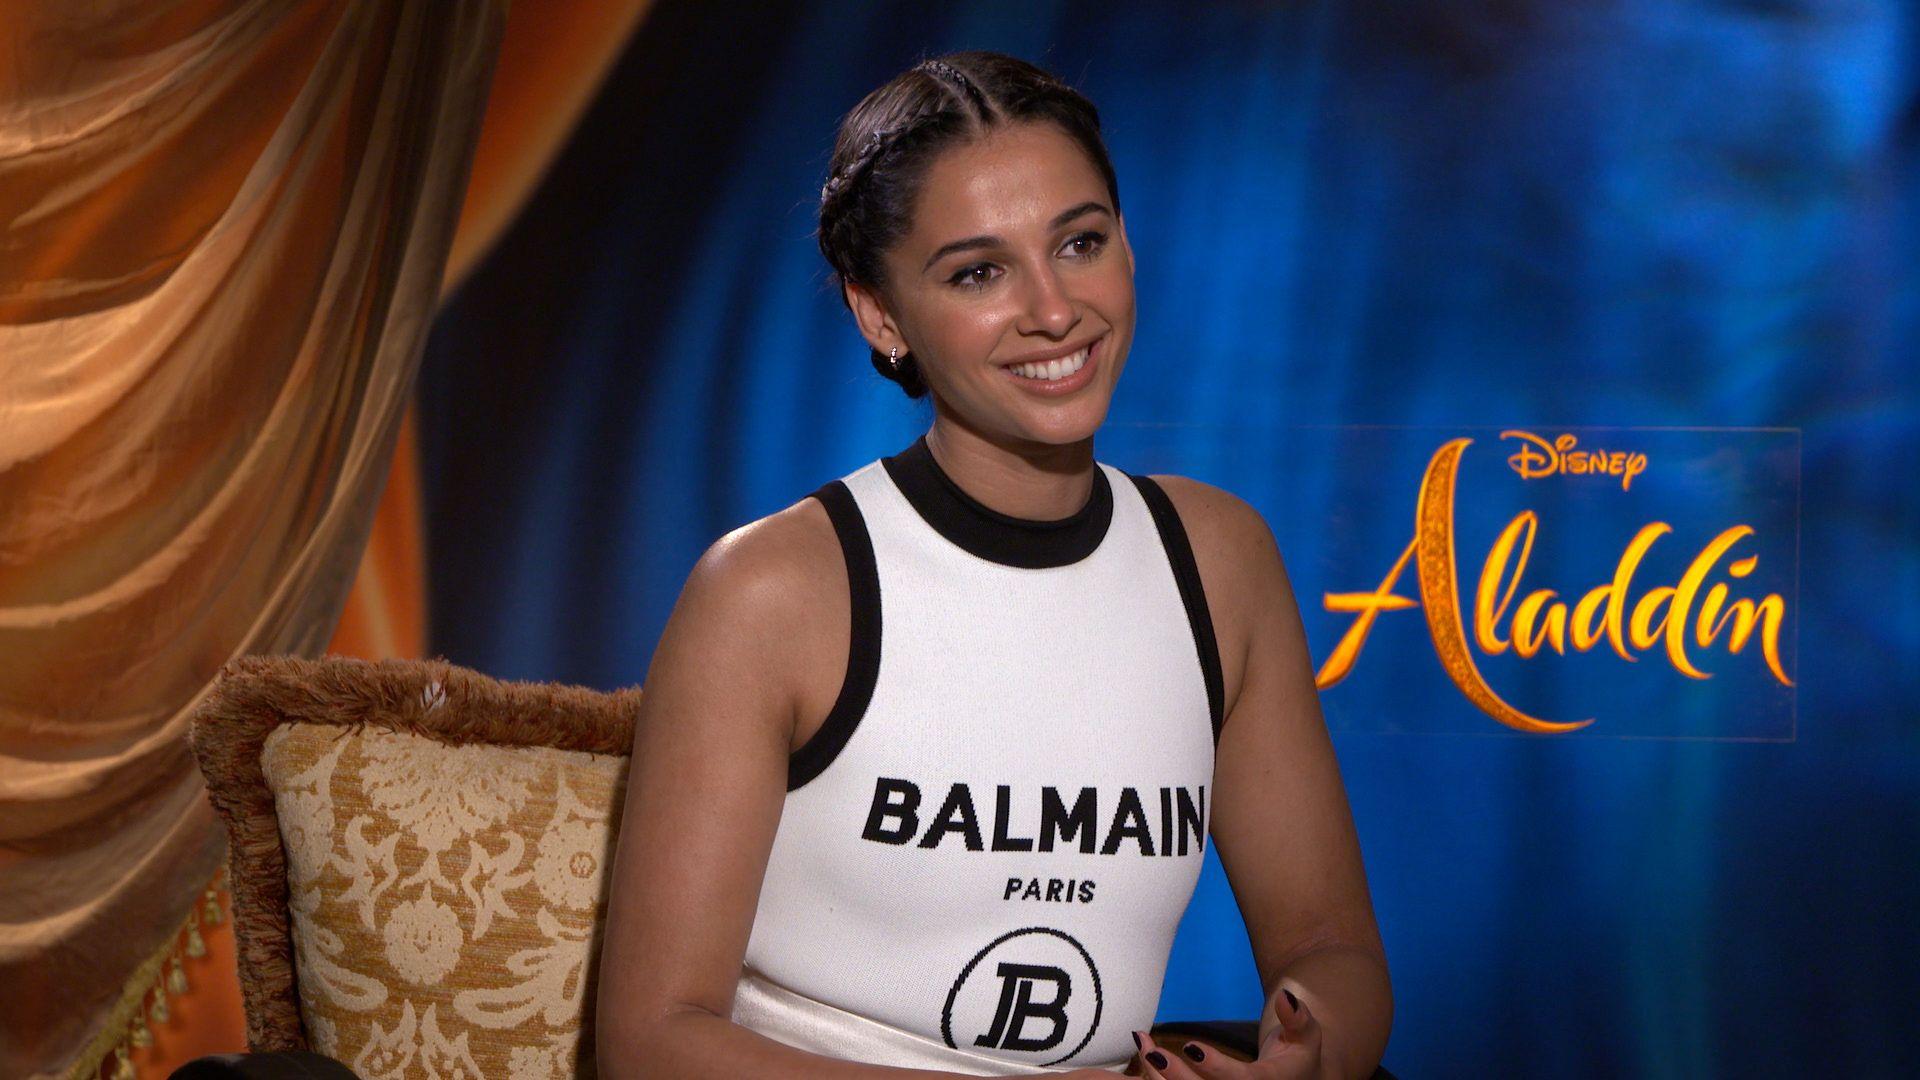 Aladdin Star Naomi Scott On Playing Jasmine And Training